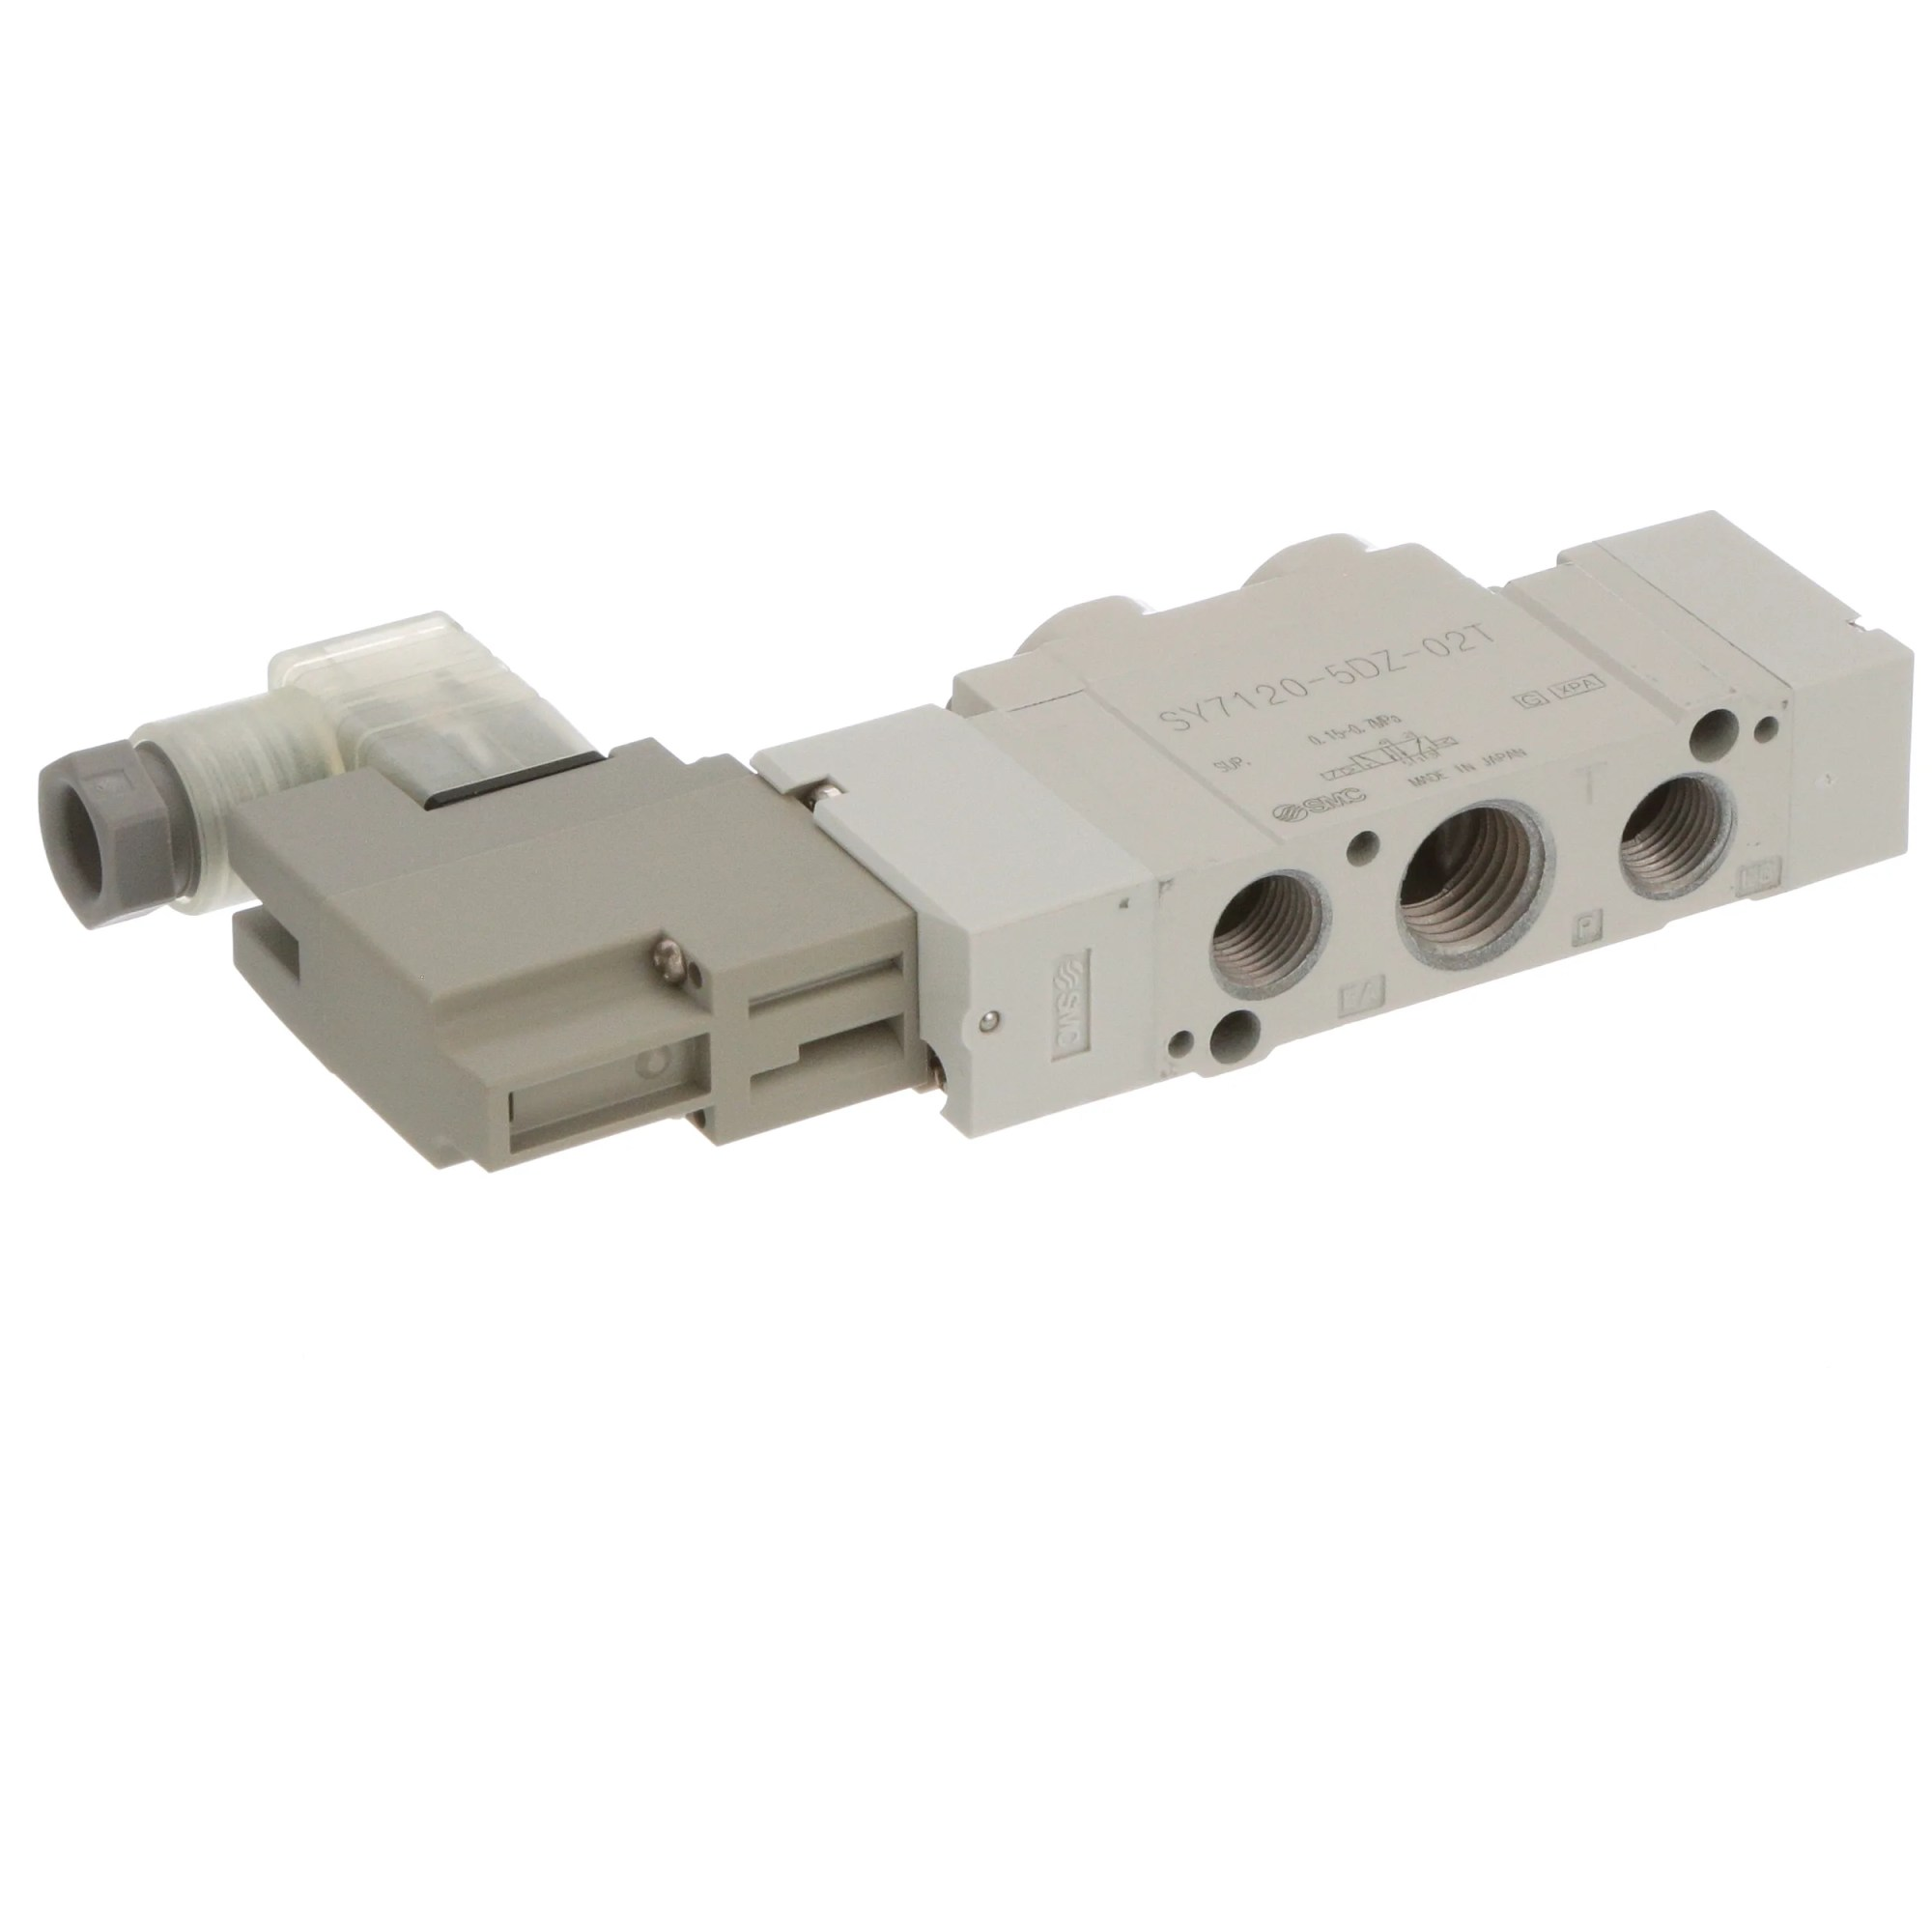 hight resolution of 20v wiring diagram 120vac wiring on 120v led wiring